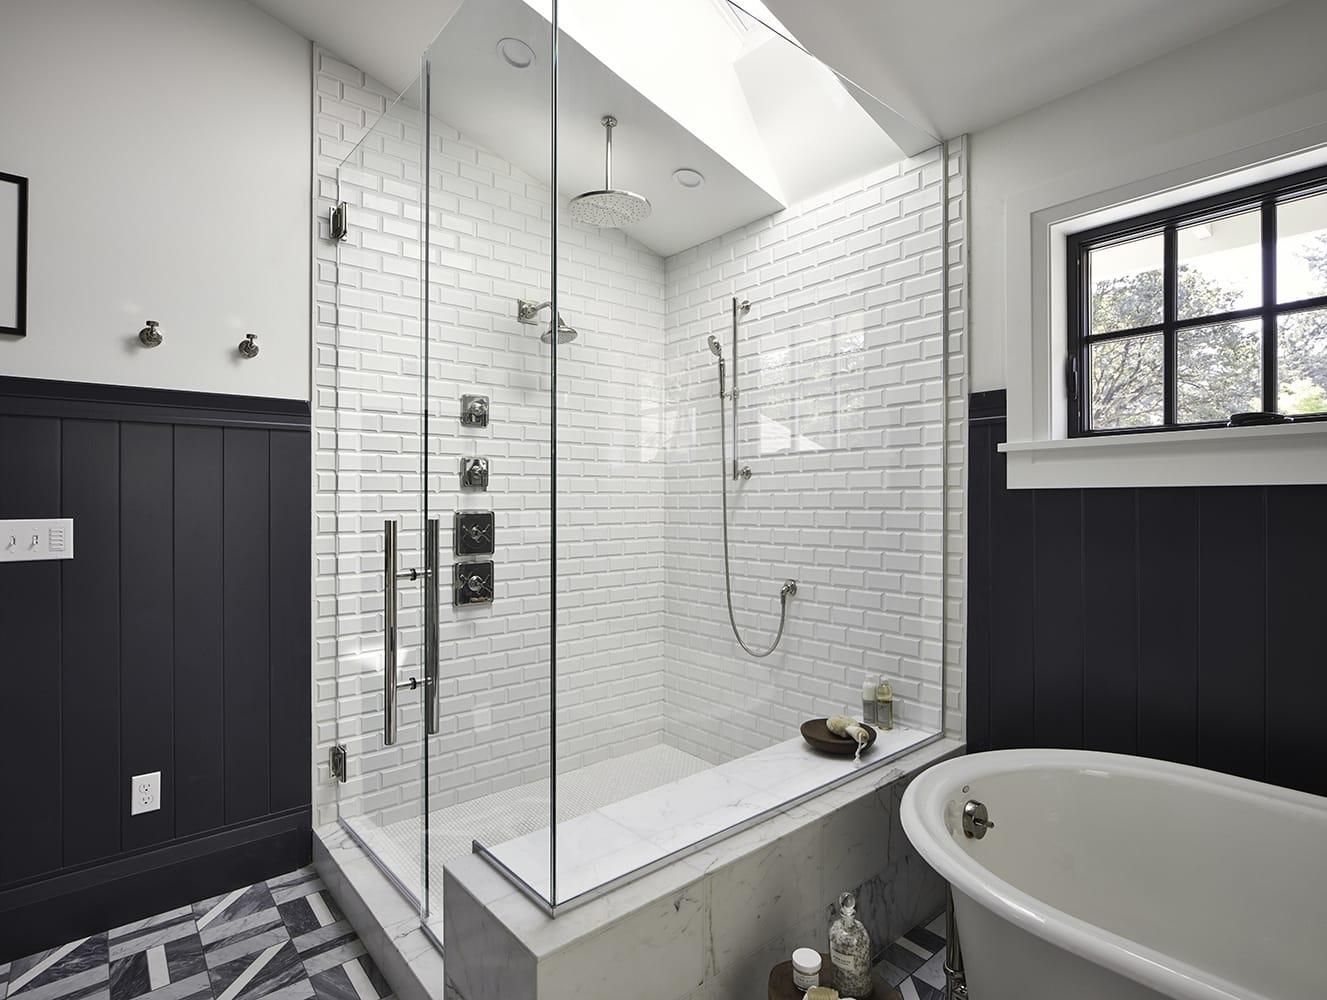 vented bathroom skylight lighting